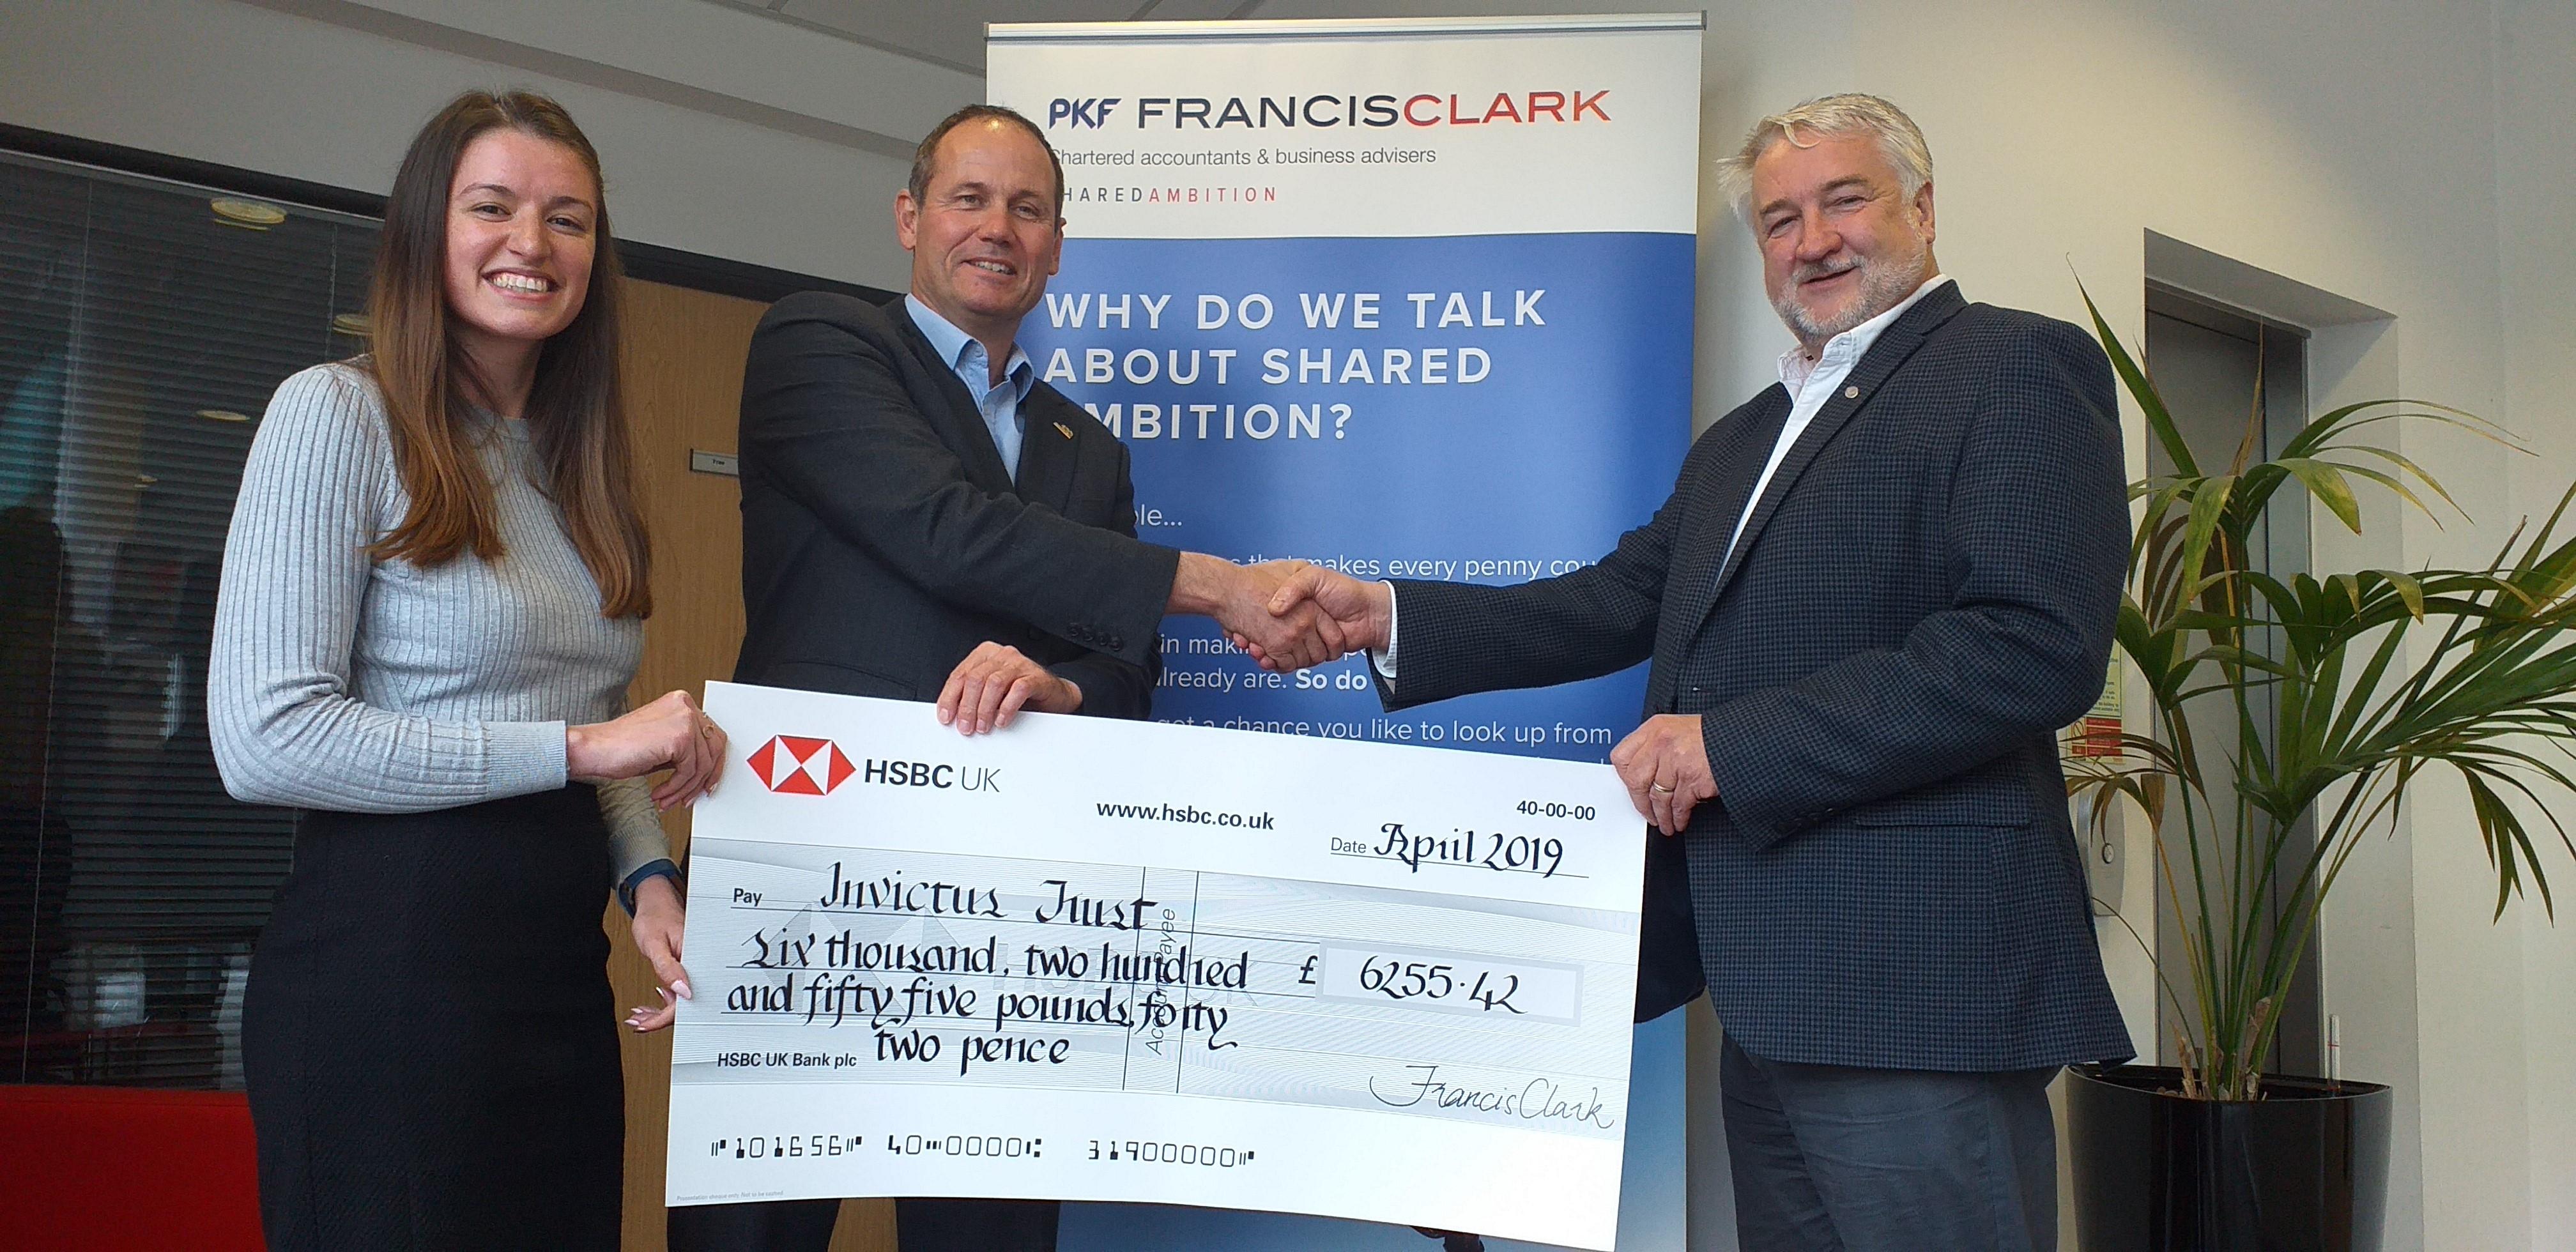 Accountant raises £6k for Invictus Trust | Business Cornwall